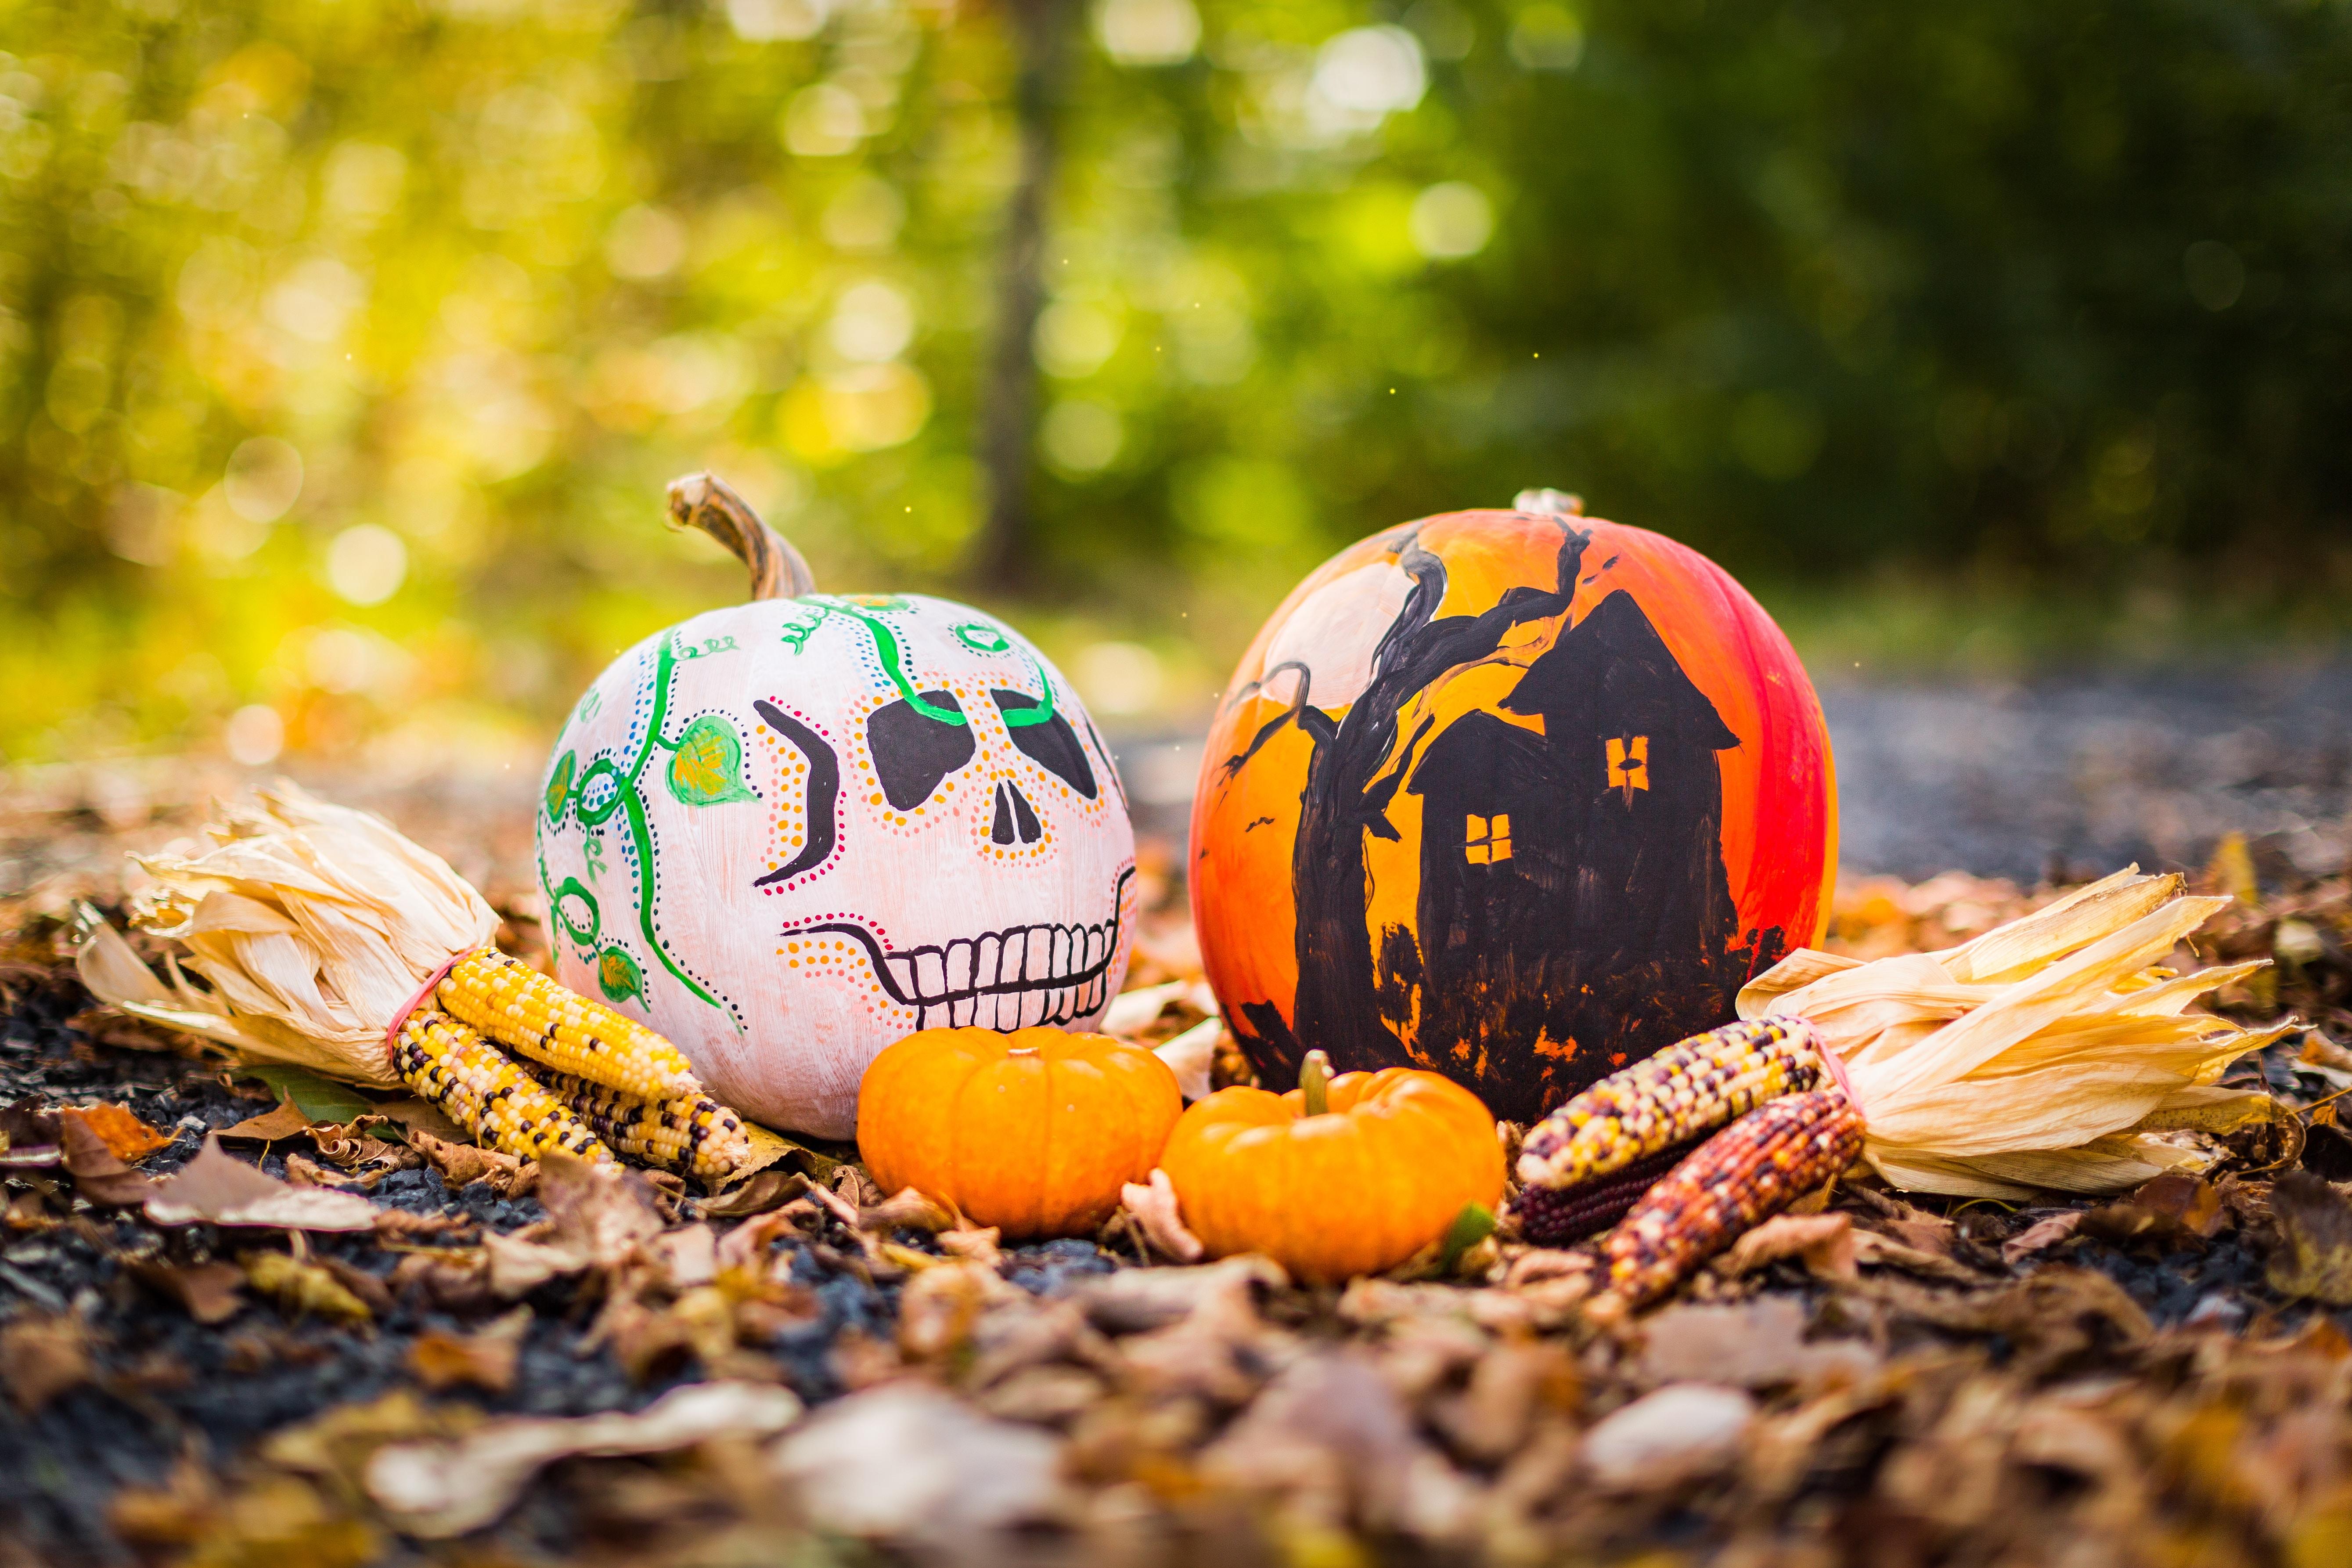 evolve-companies-halloween-blog-painted-pumpkins